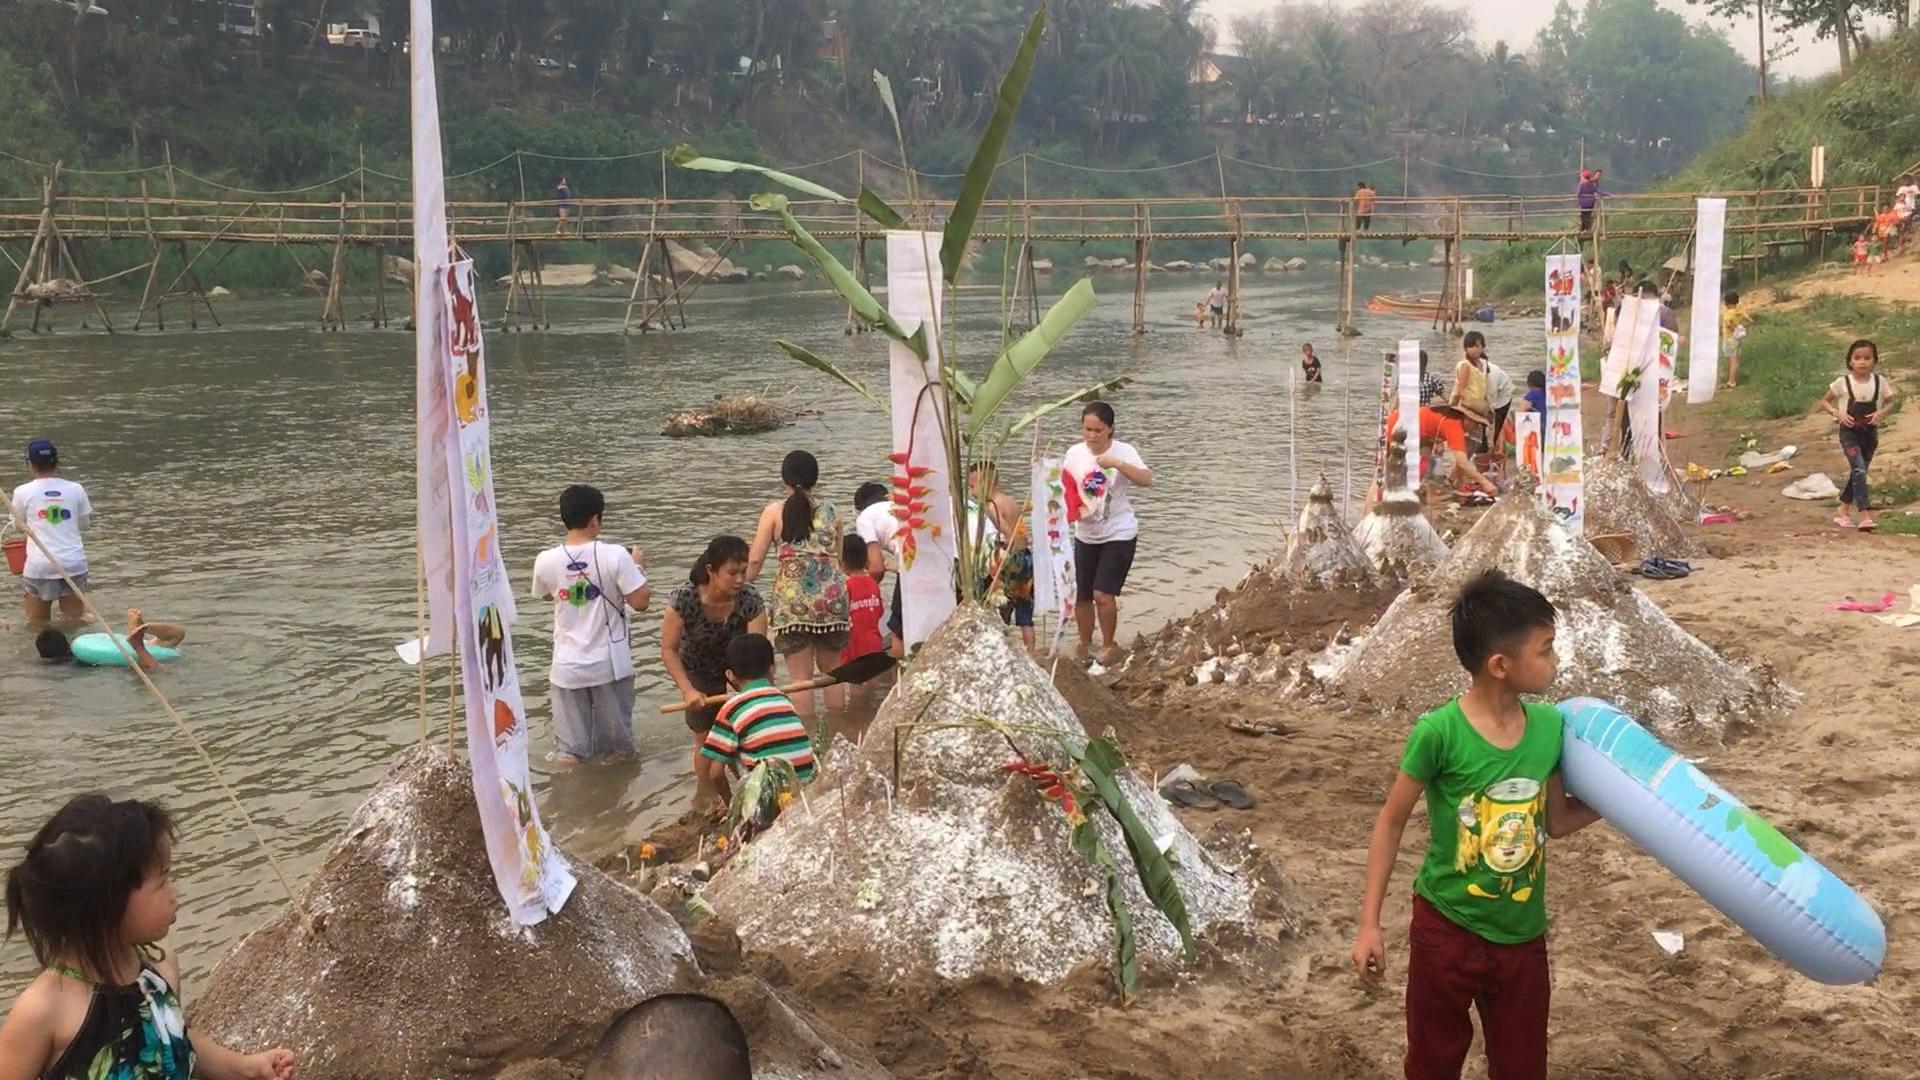 dbate-Laos-Reiseblog (4)